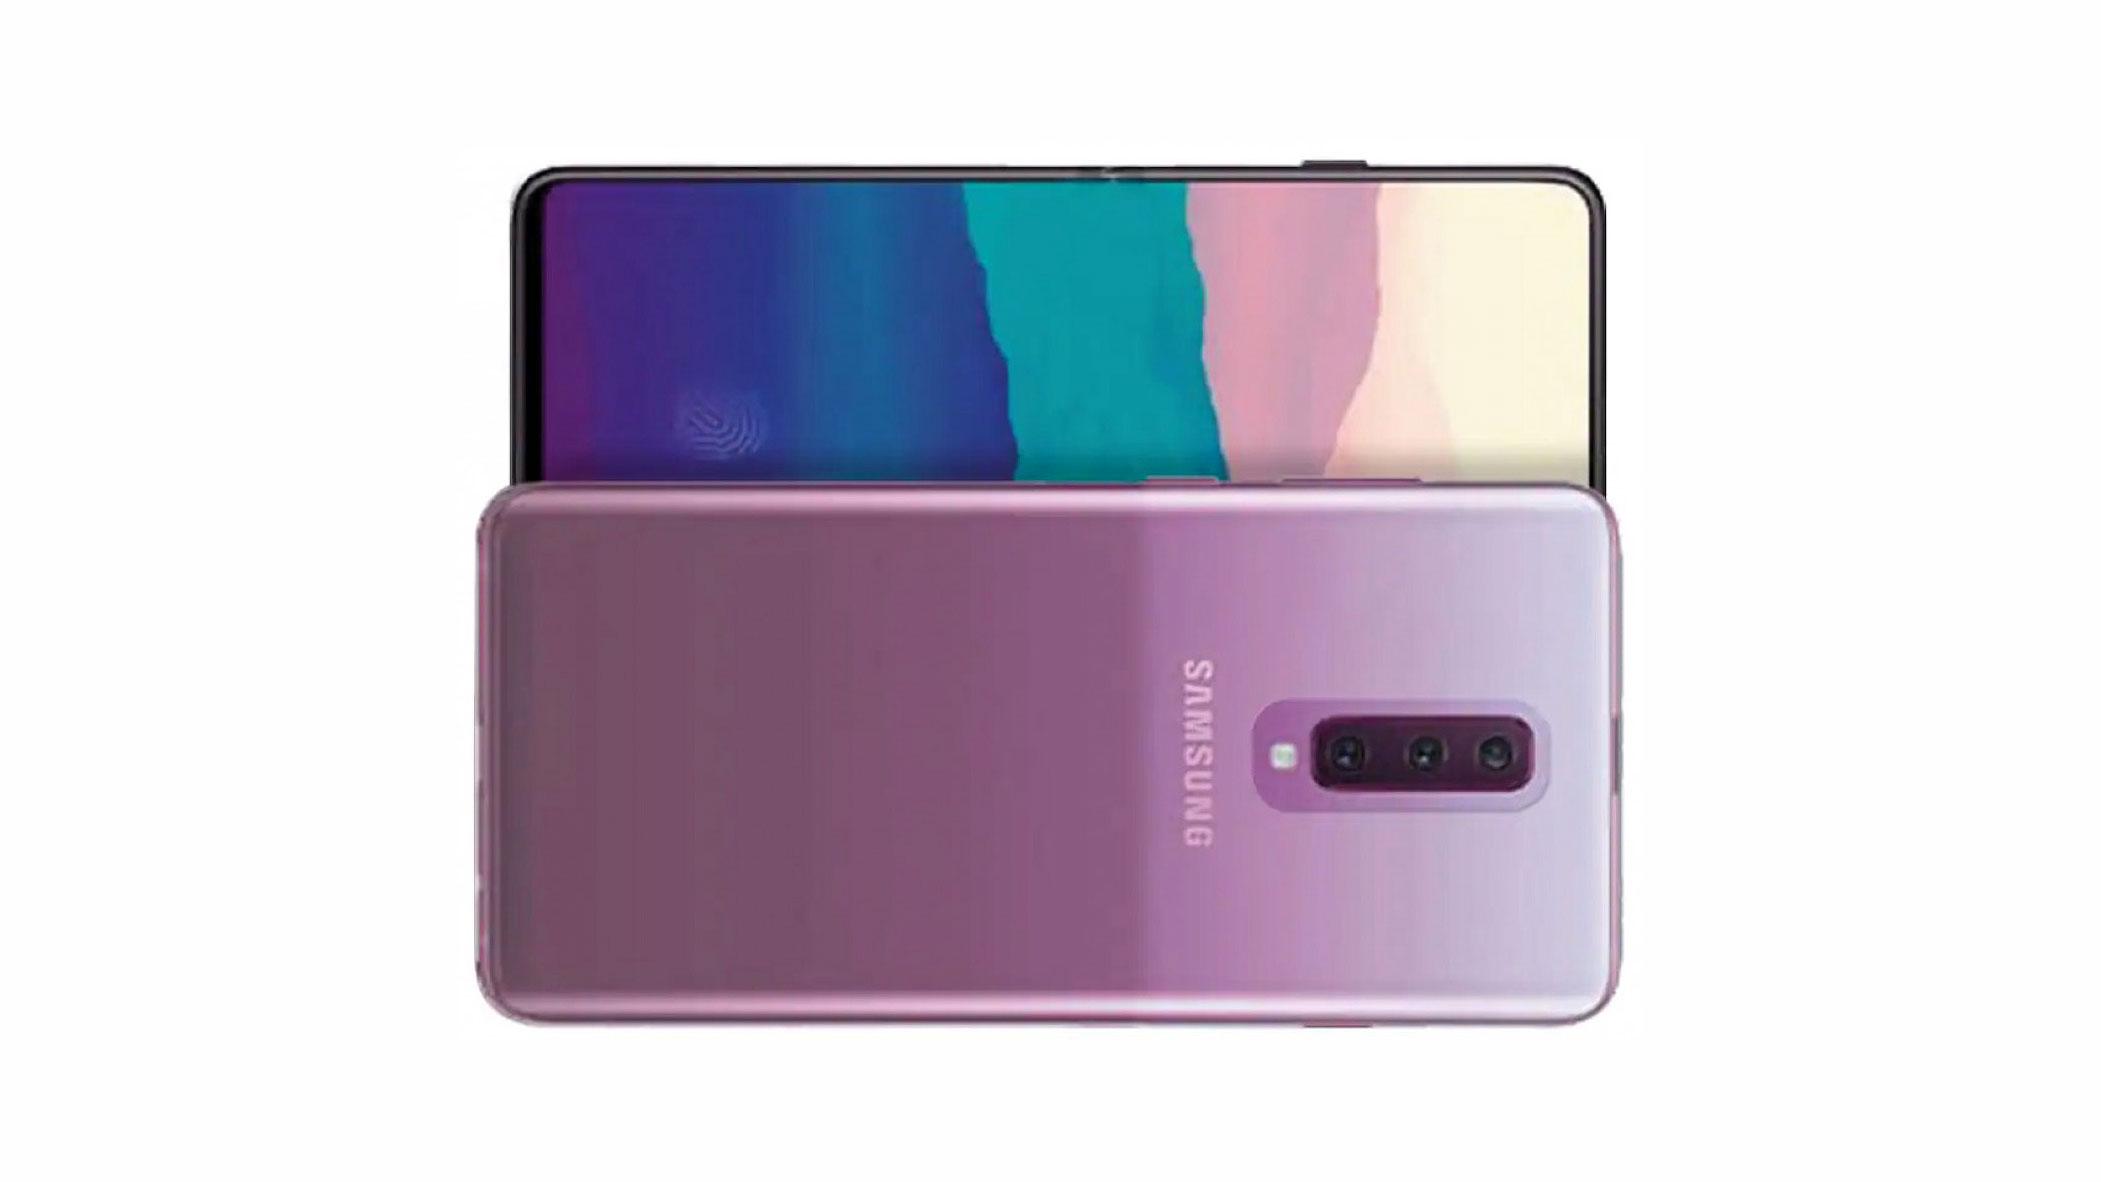 قاب گلکسی ای ۹۰ (Galaxy A90)